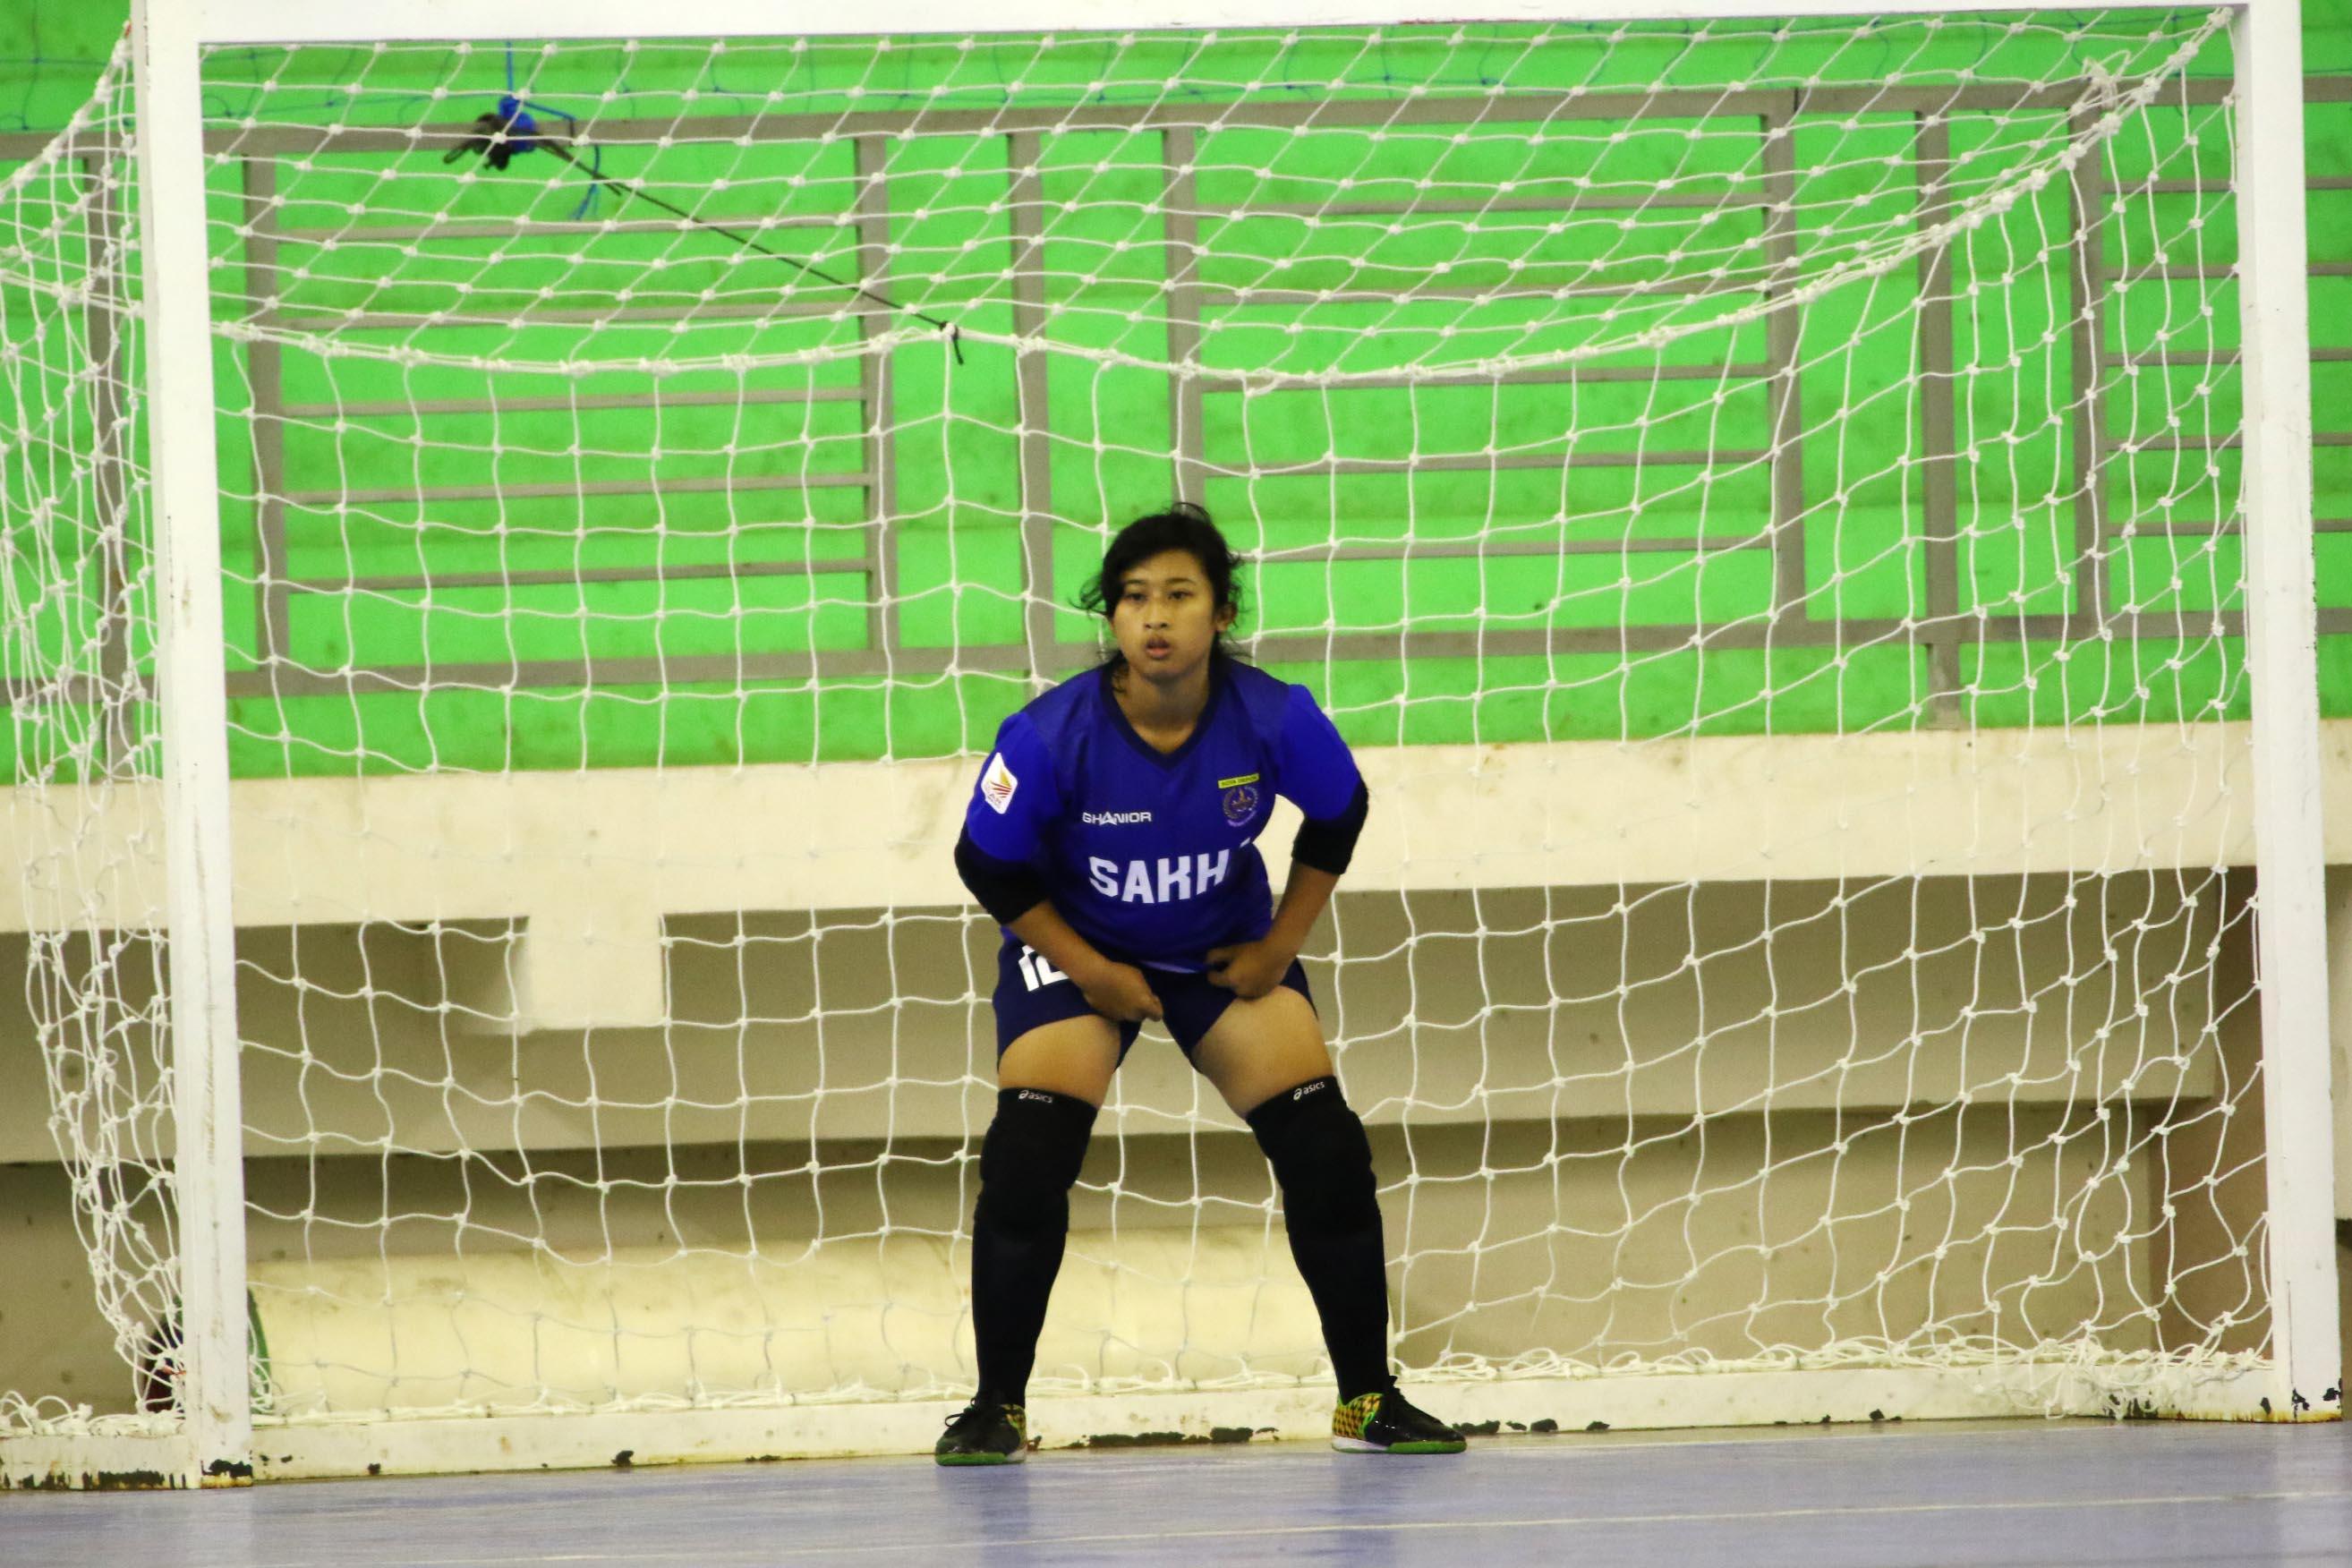 Ria Ayu Prastika Kiper Futsal putri saat  bertanding di GOR ITB Jatinangor Sumedang Jawa barat